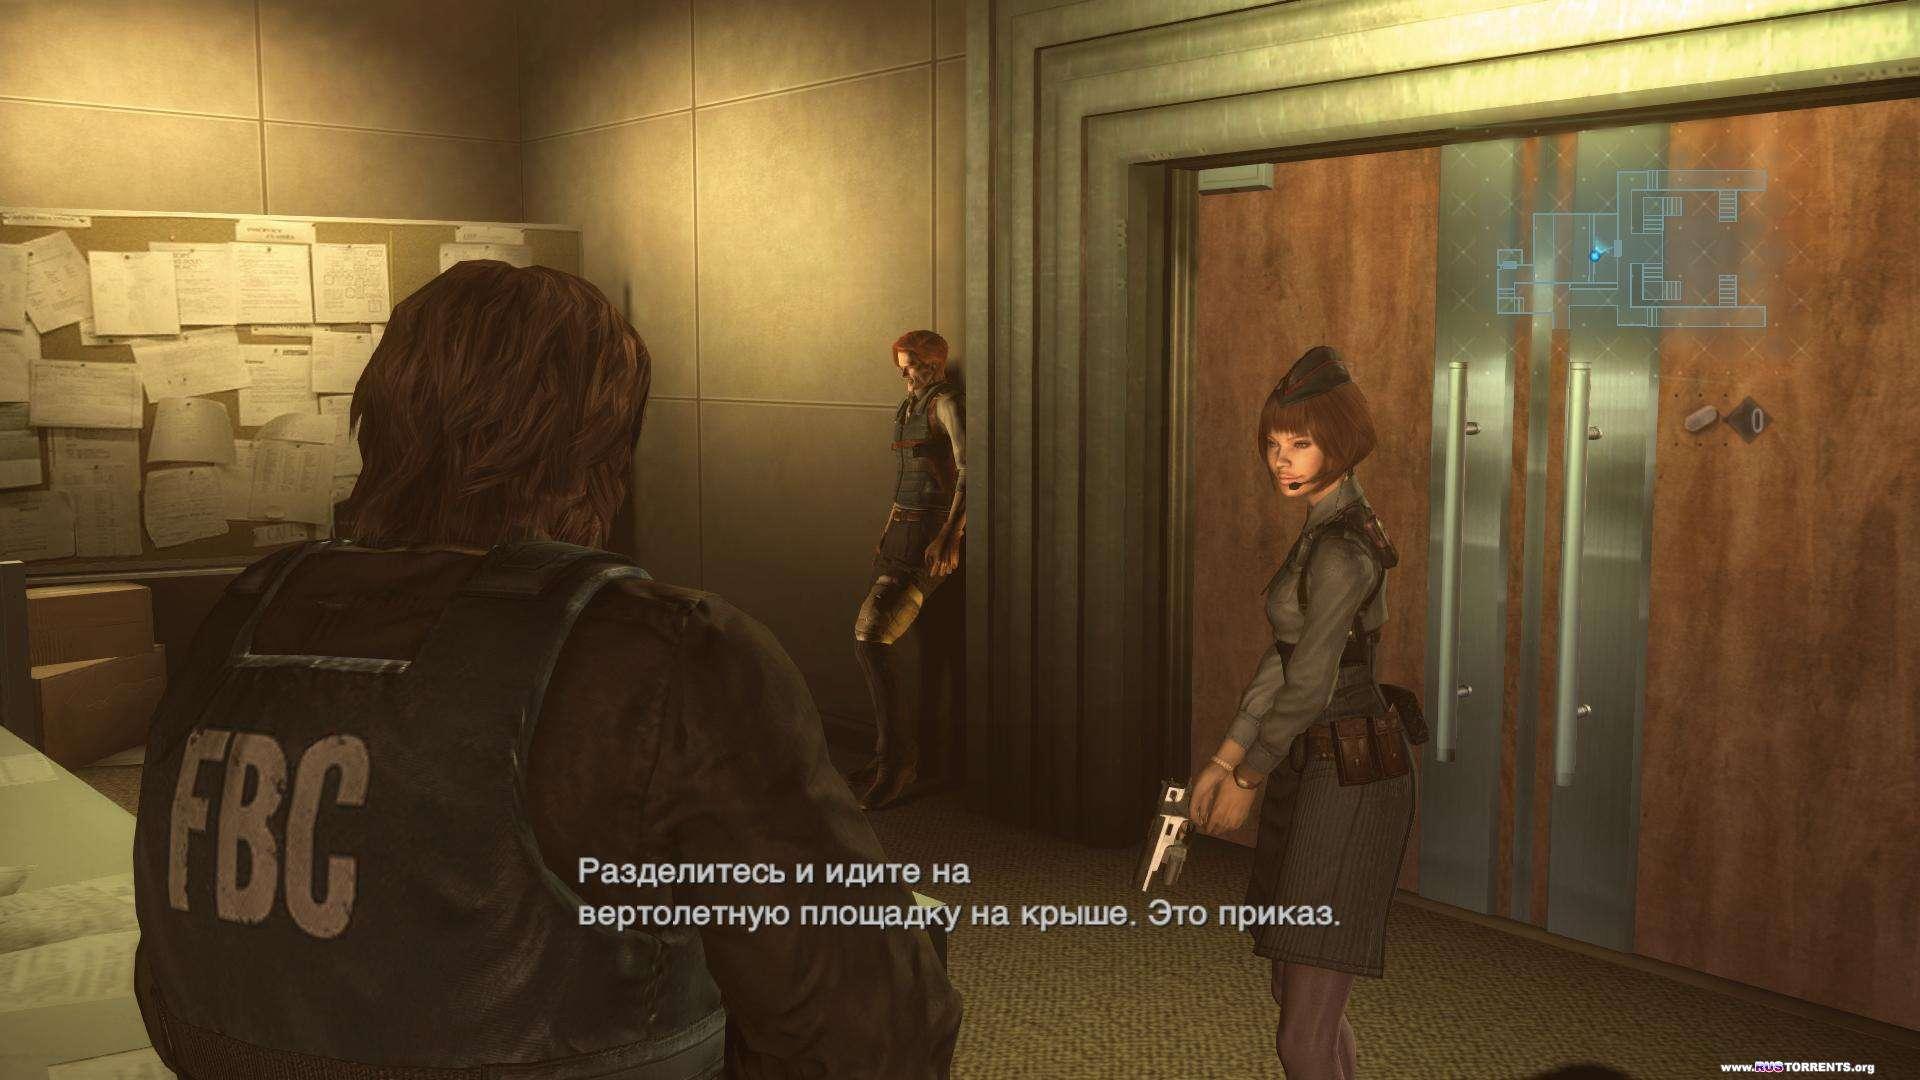 Resident Evil: Revelations + 3 DLC (Capcom - 1С-Софтклаб) (Update 3) (RUS-ENG) [Repack] От R.G. Revenants